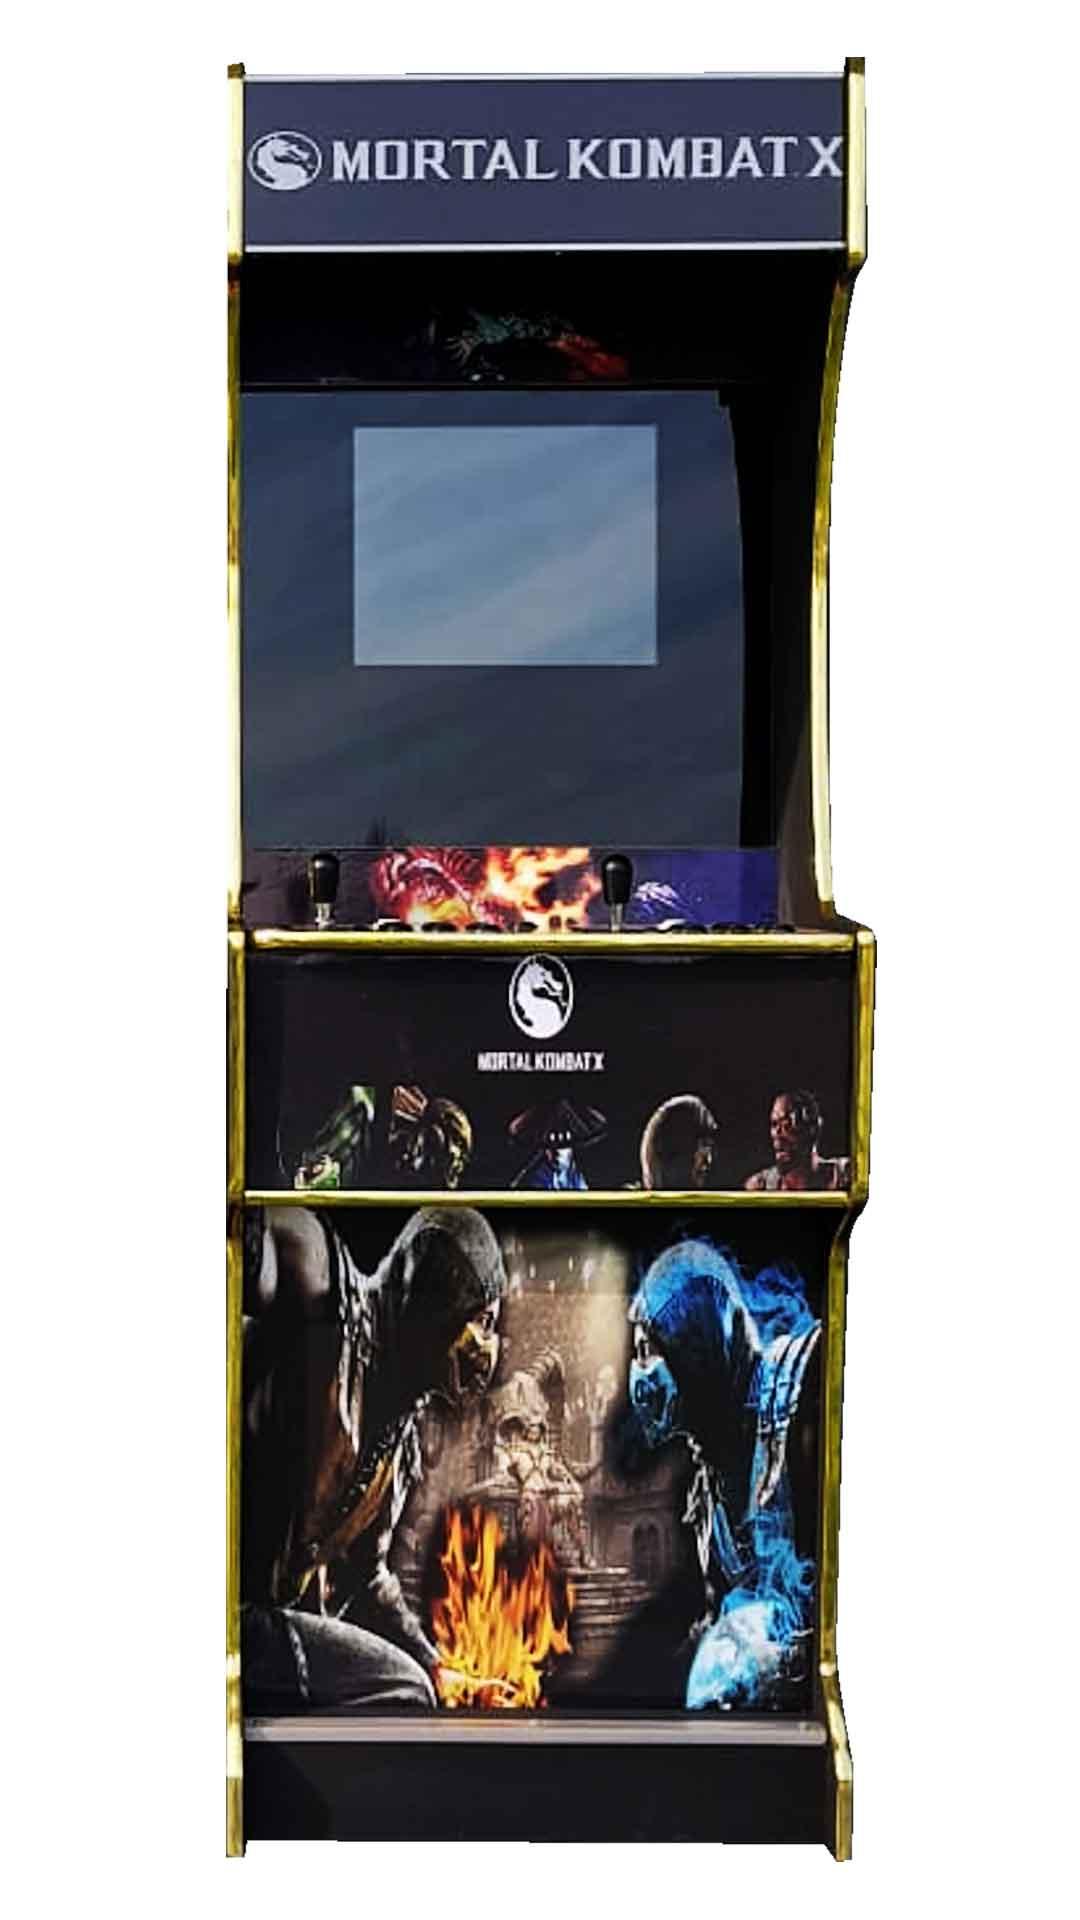 Arcade Mortal Kombat